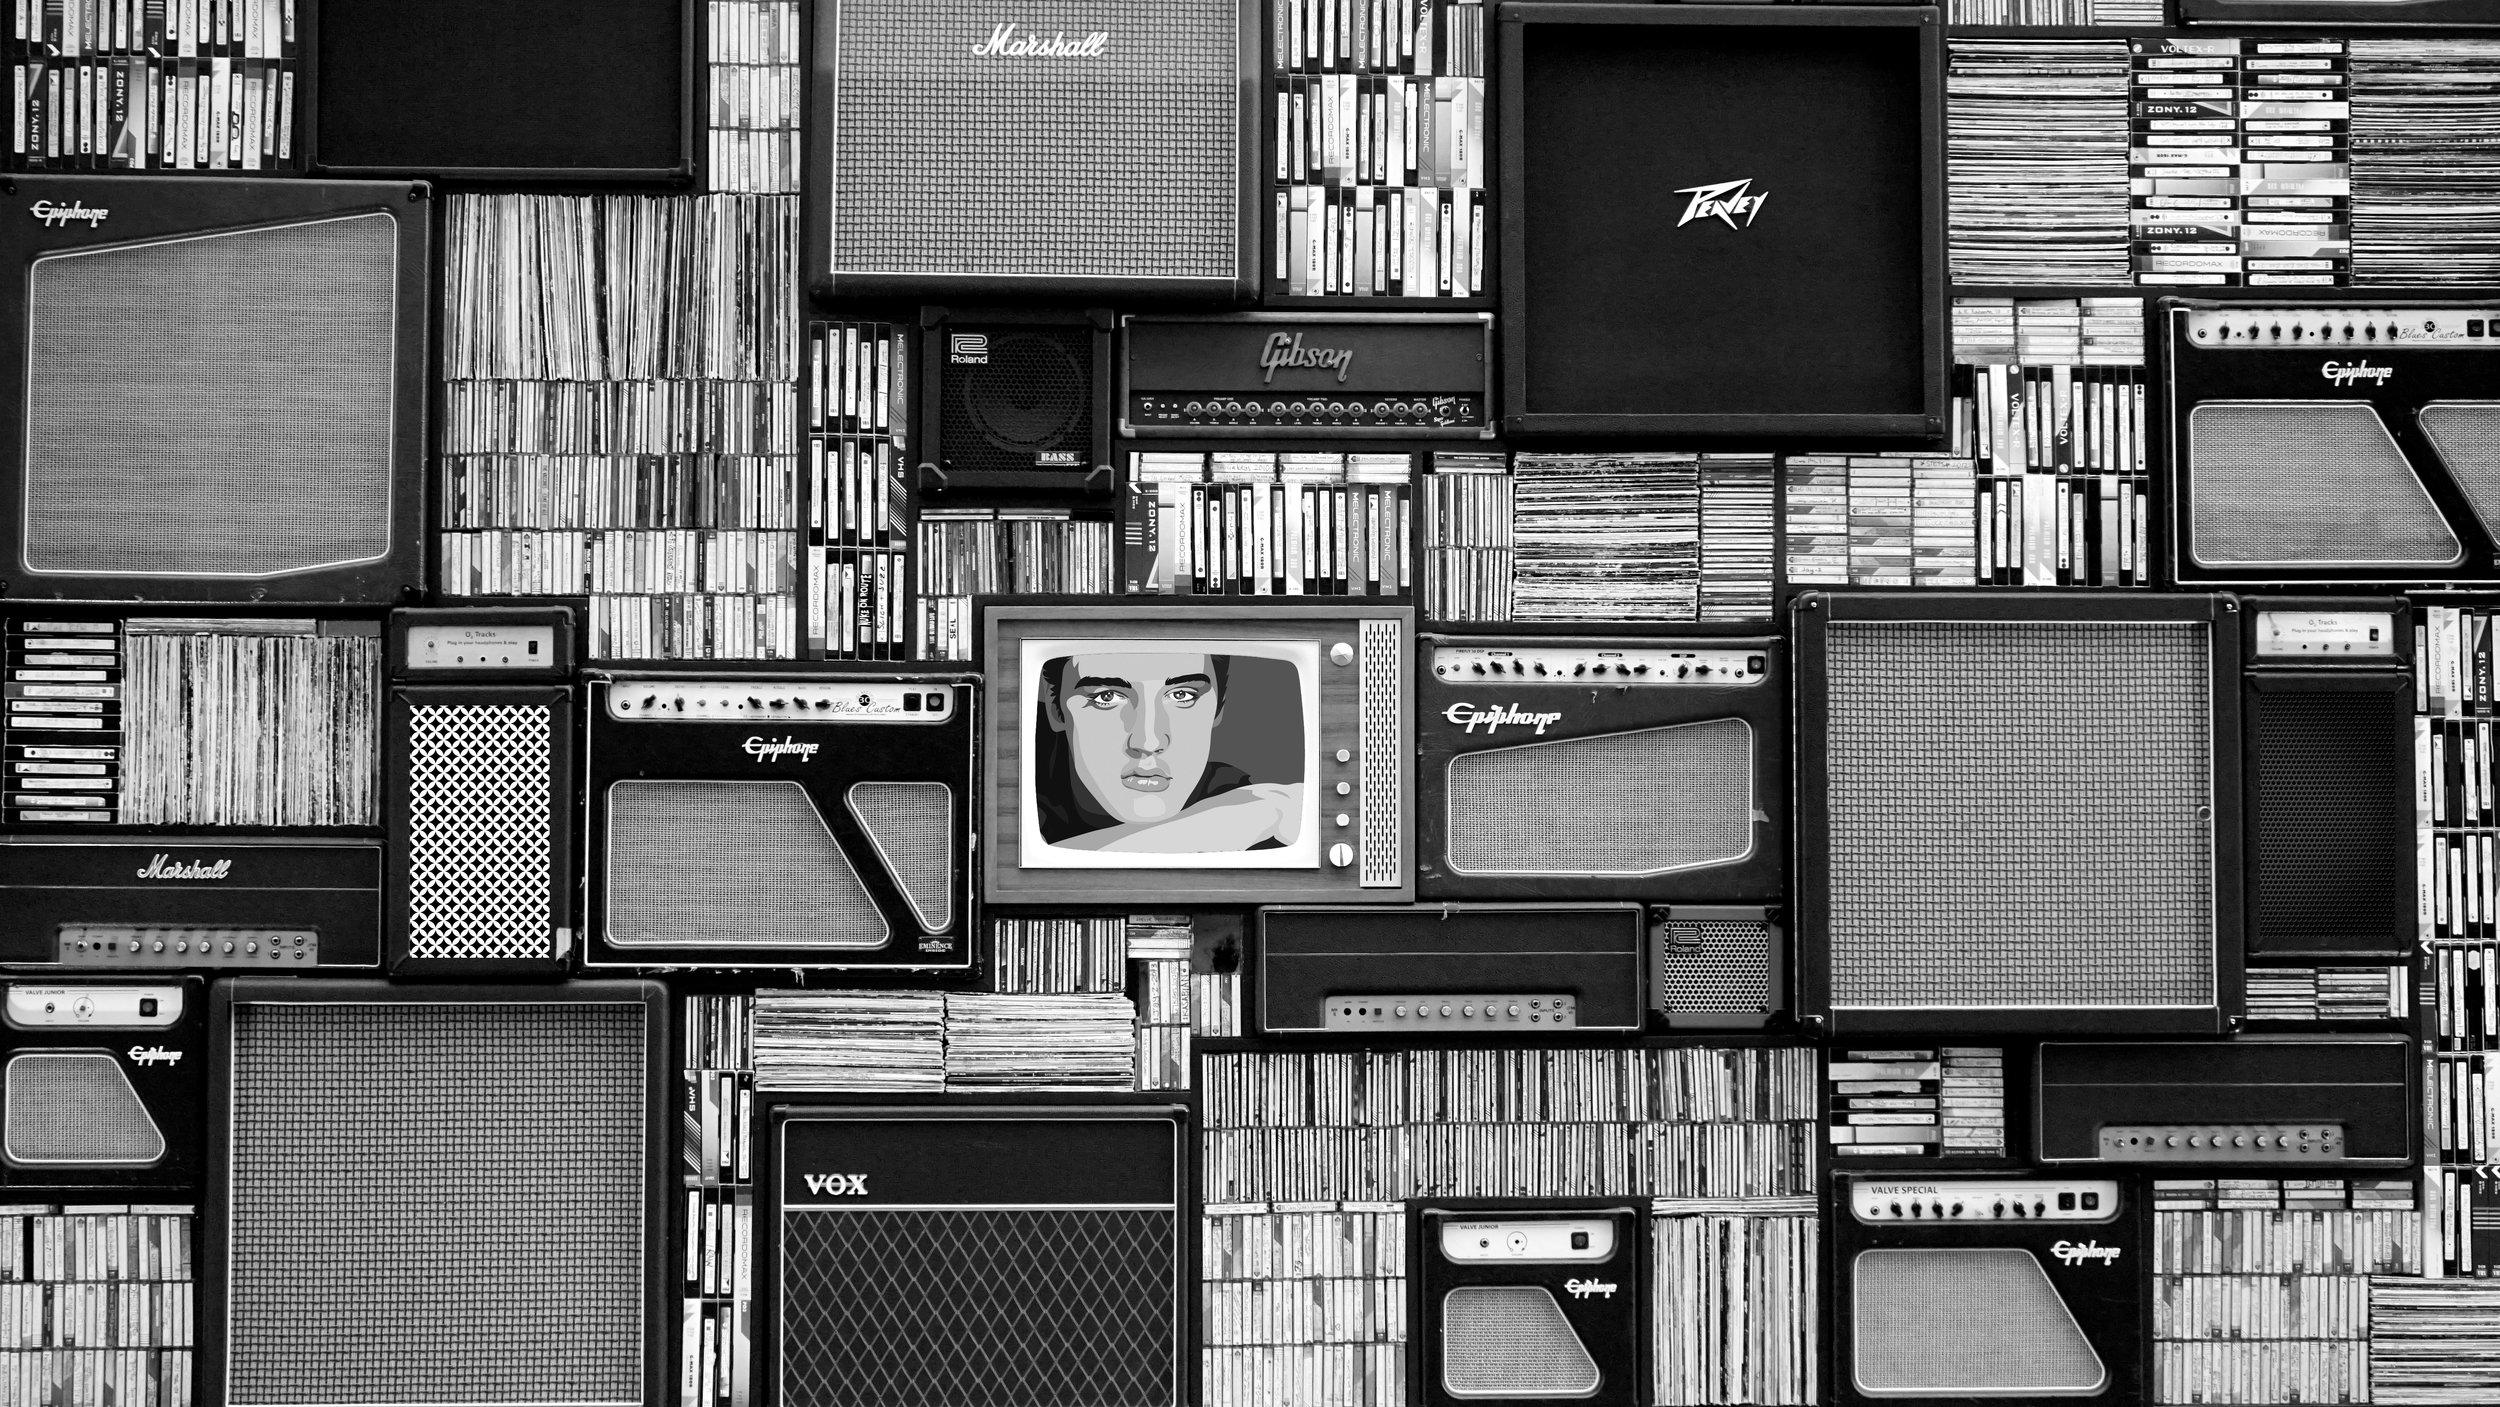 amplifier-artist-audio-114820.jpg